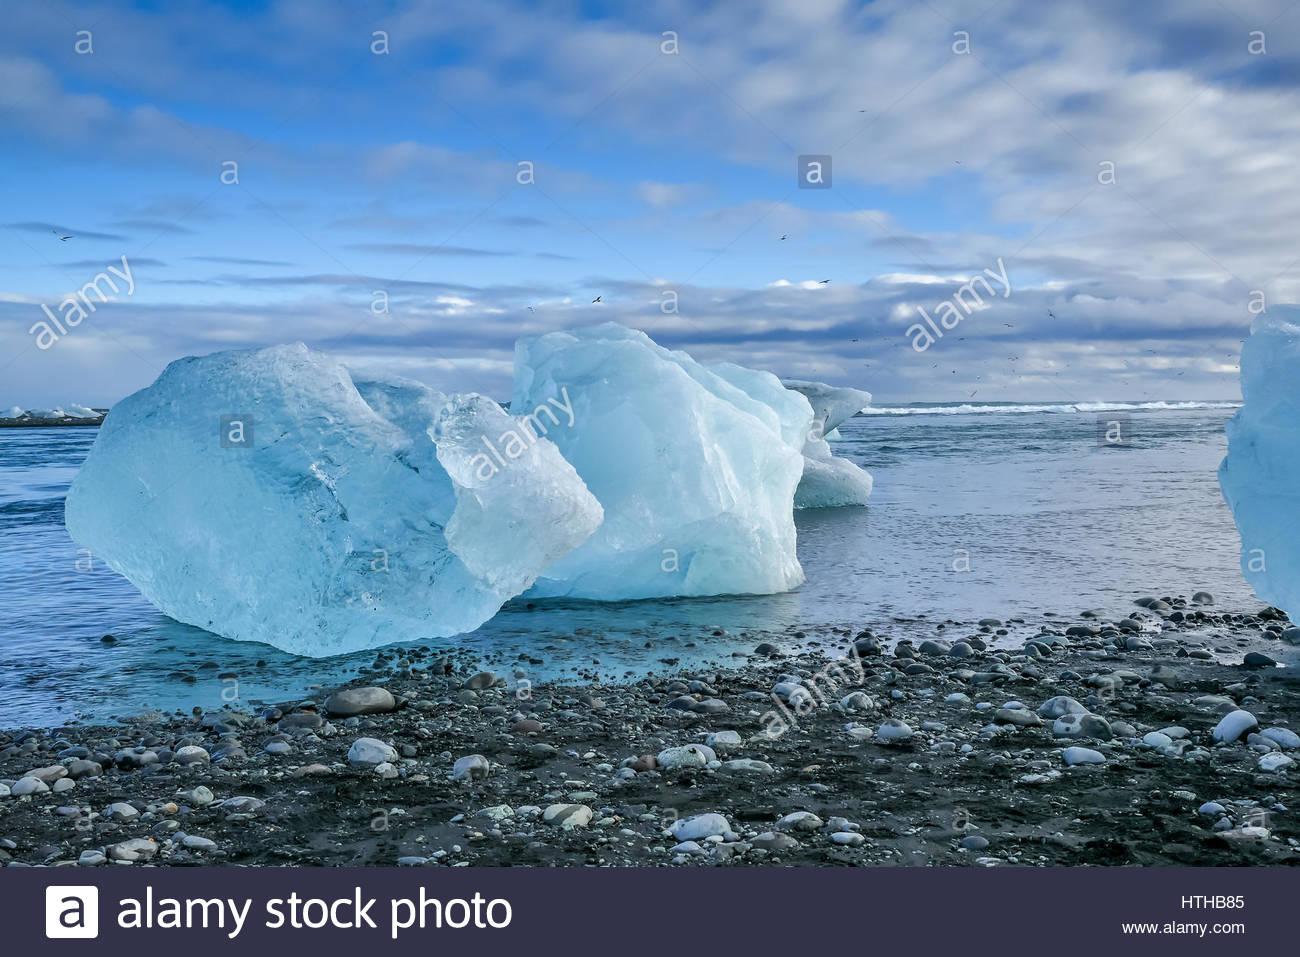 Blue icebergs on black lava sand beach at Jokulsarlon iceberg lagoon, Iceland - Stock Image